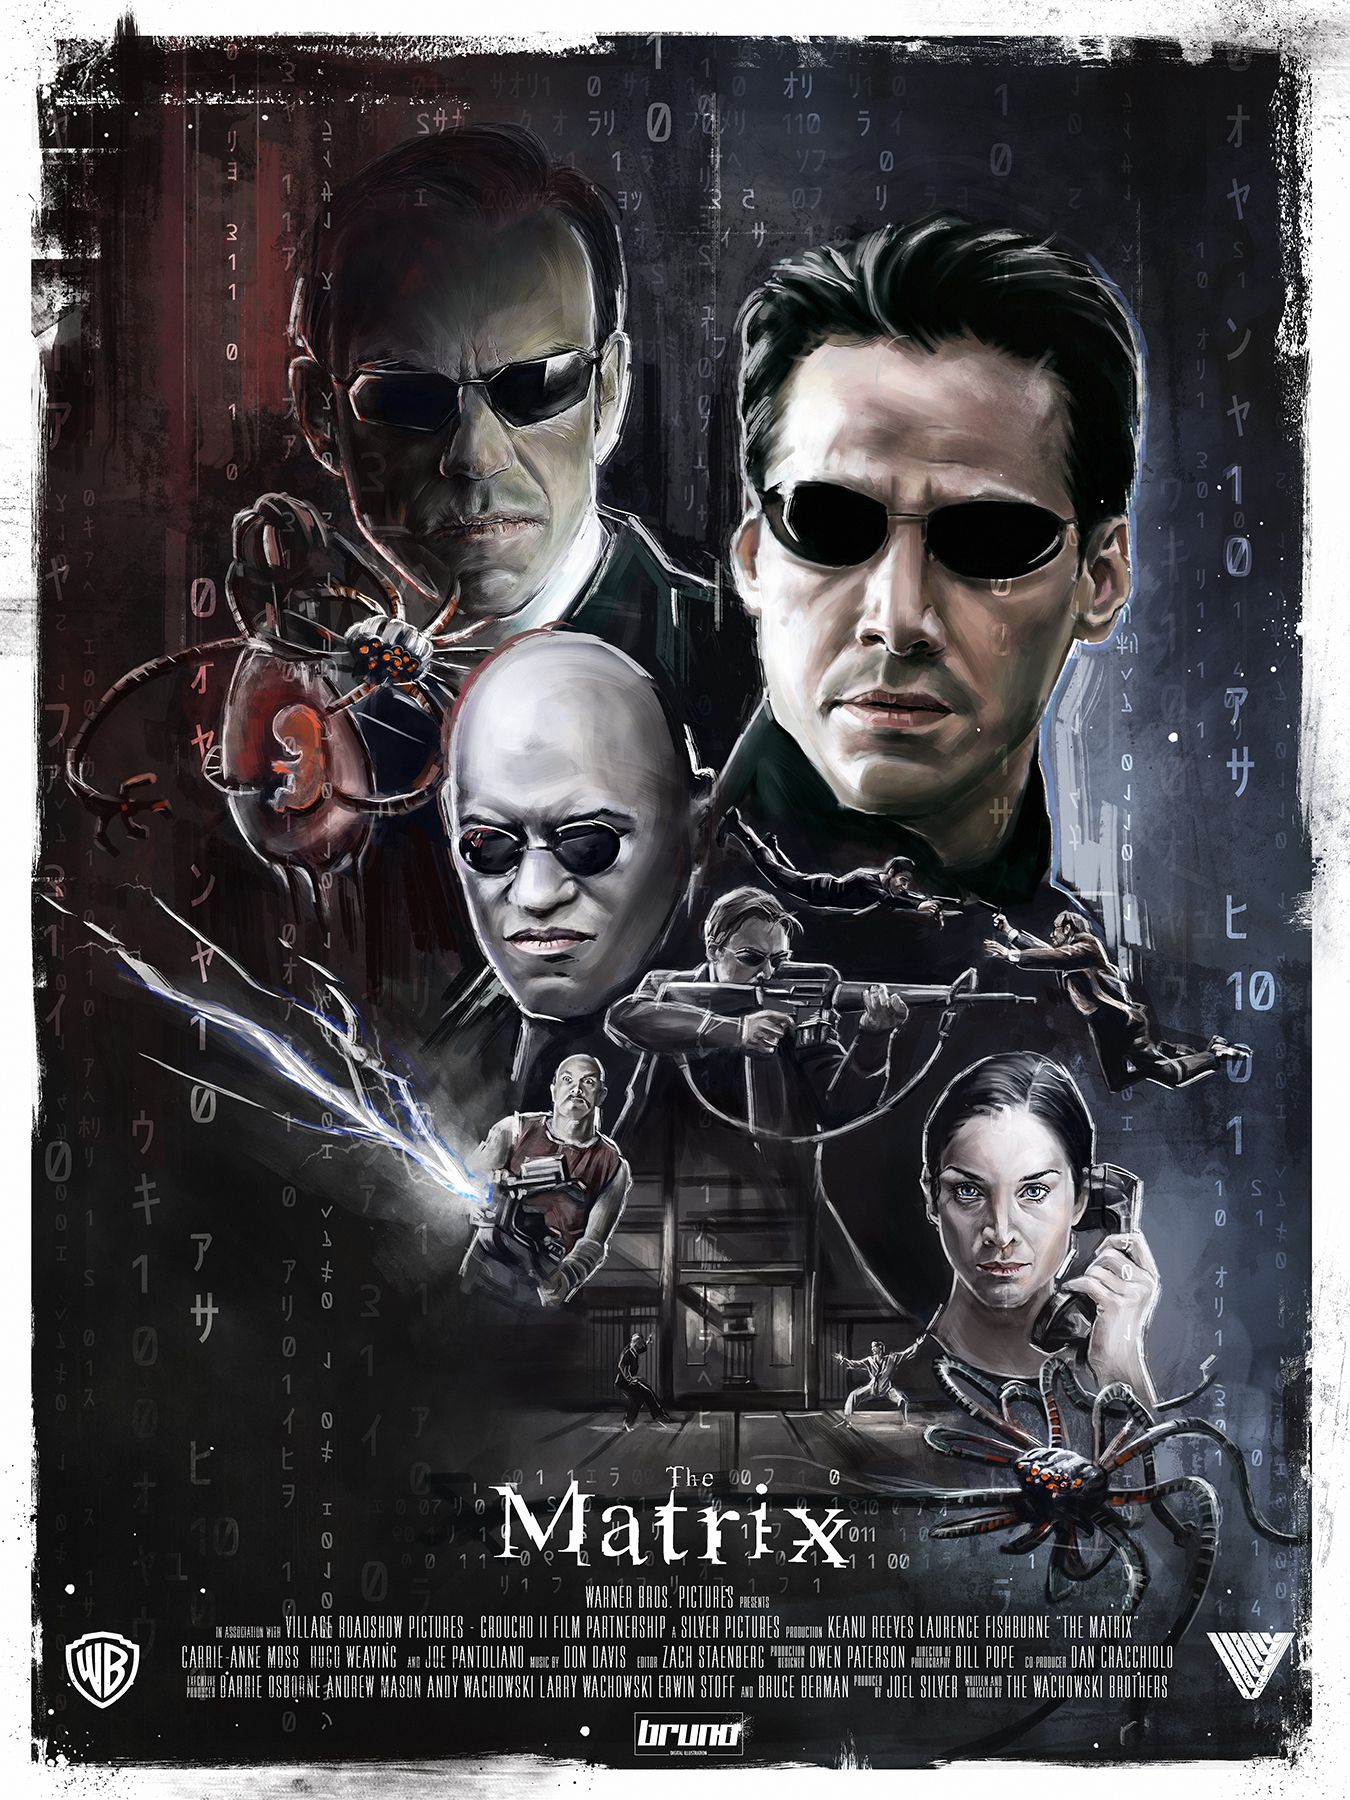 Matrix Poster Jpg 1350 1800 Movie Artwork The Matrix Movie